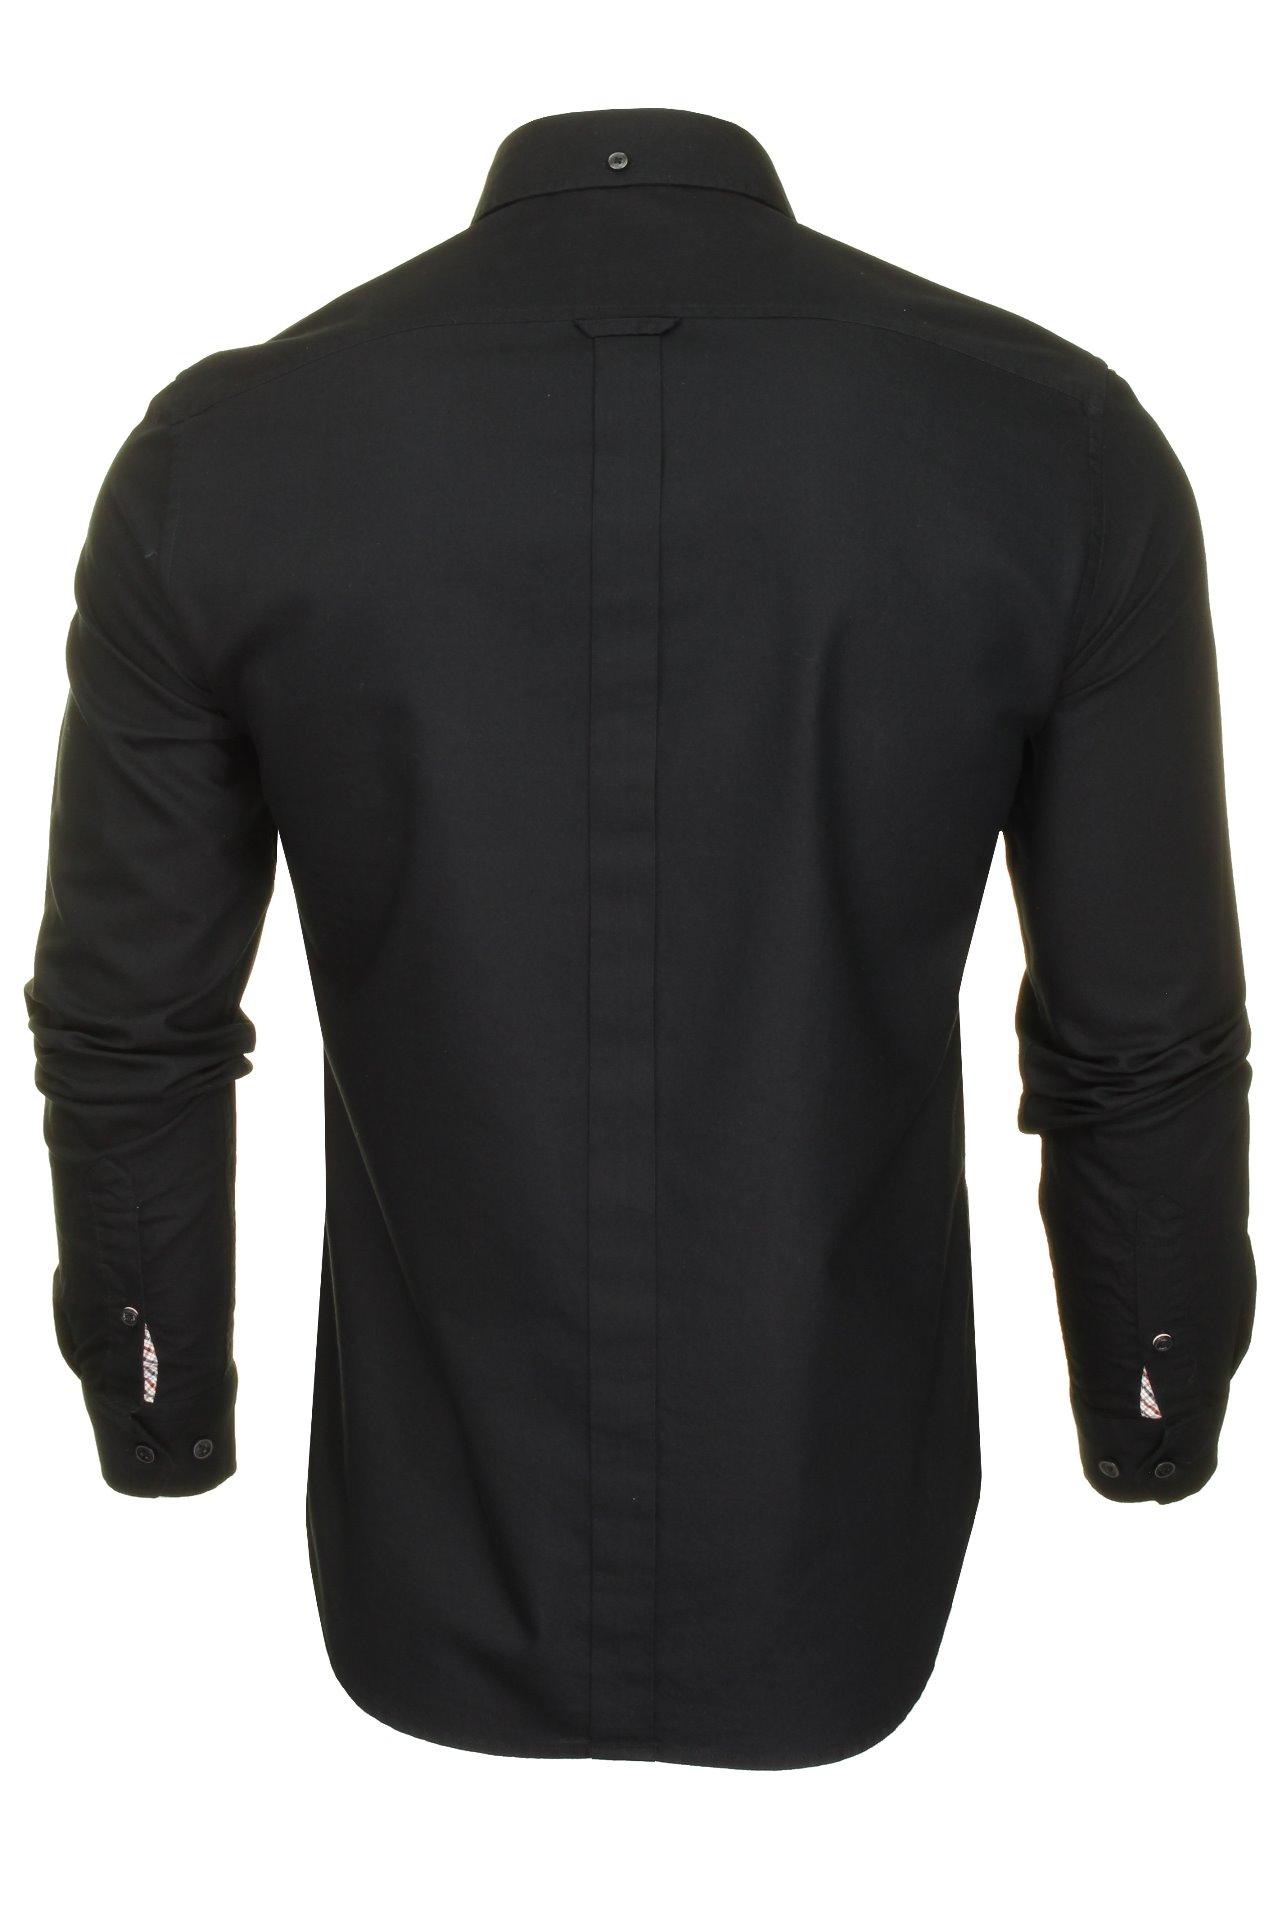 Mens-Oxford-Shirt-by-Ben-Sherman-Long-Sleeved thumbnail 8